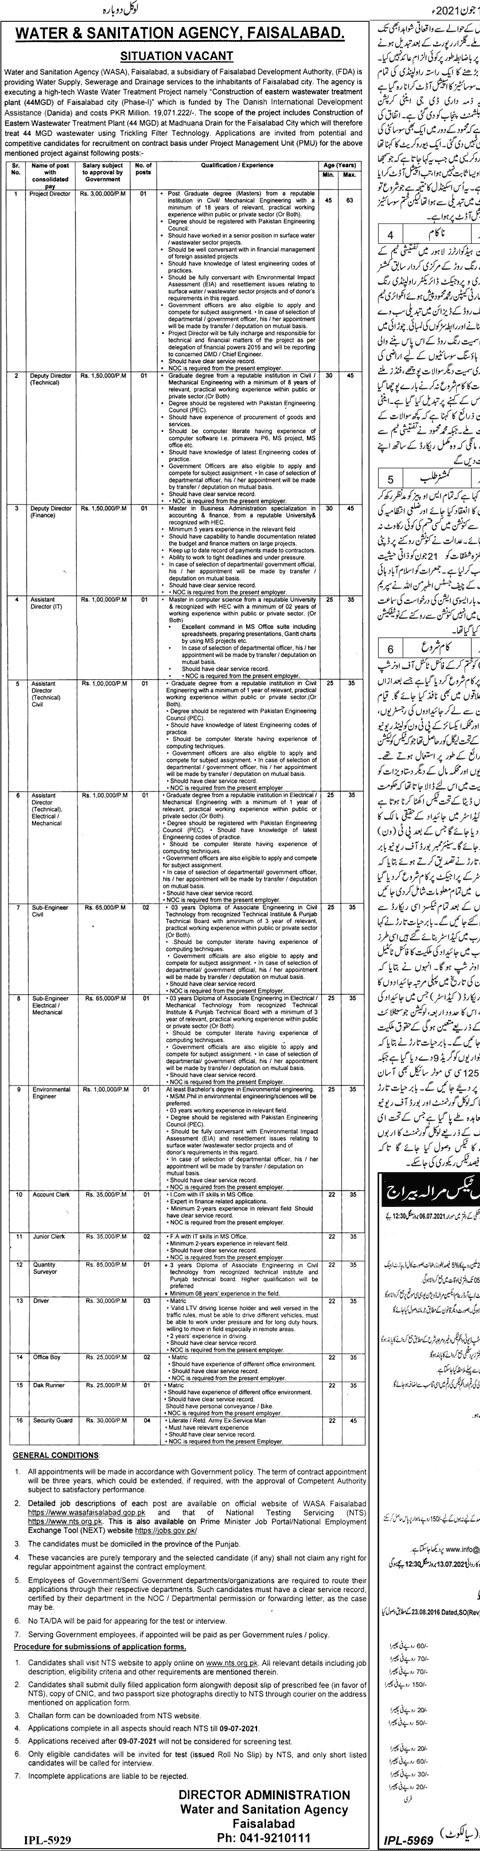 https://www.wasafaisalabad.gop.pk Jobs 2021 - Water & Sanitation Agency (WASA) 2021 in Pakistan